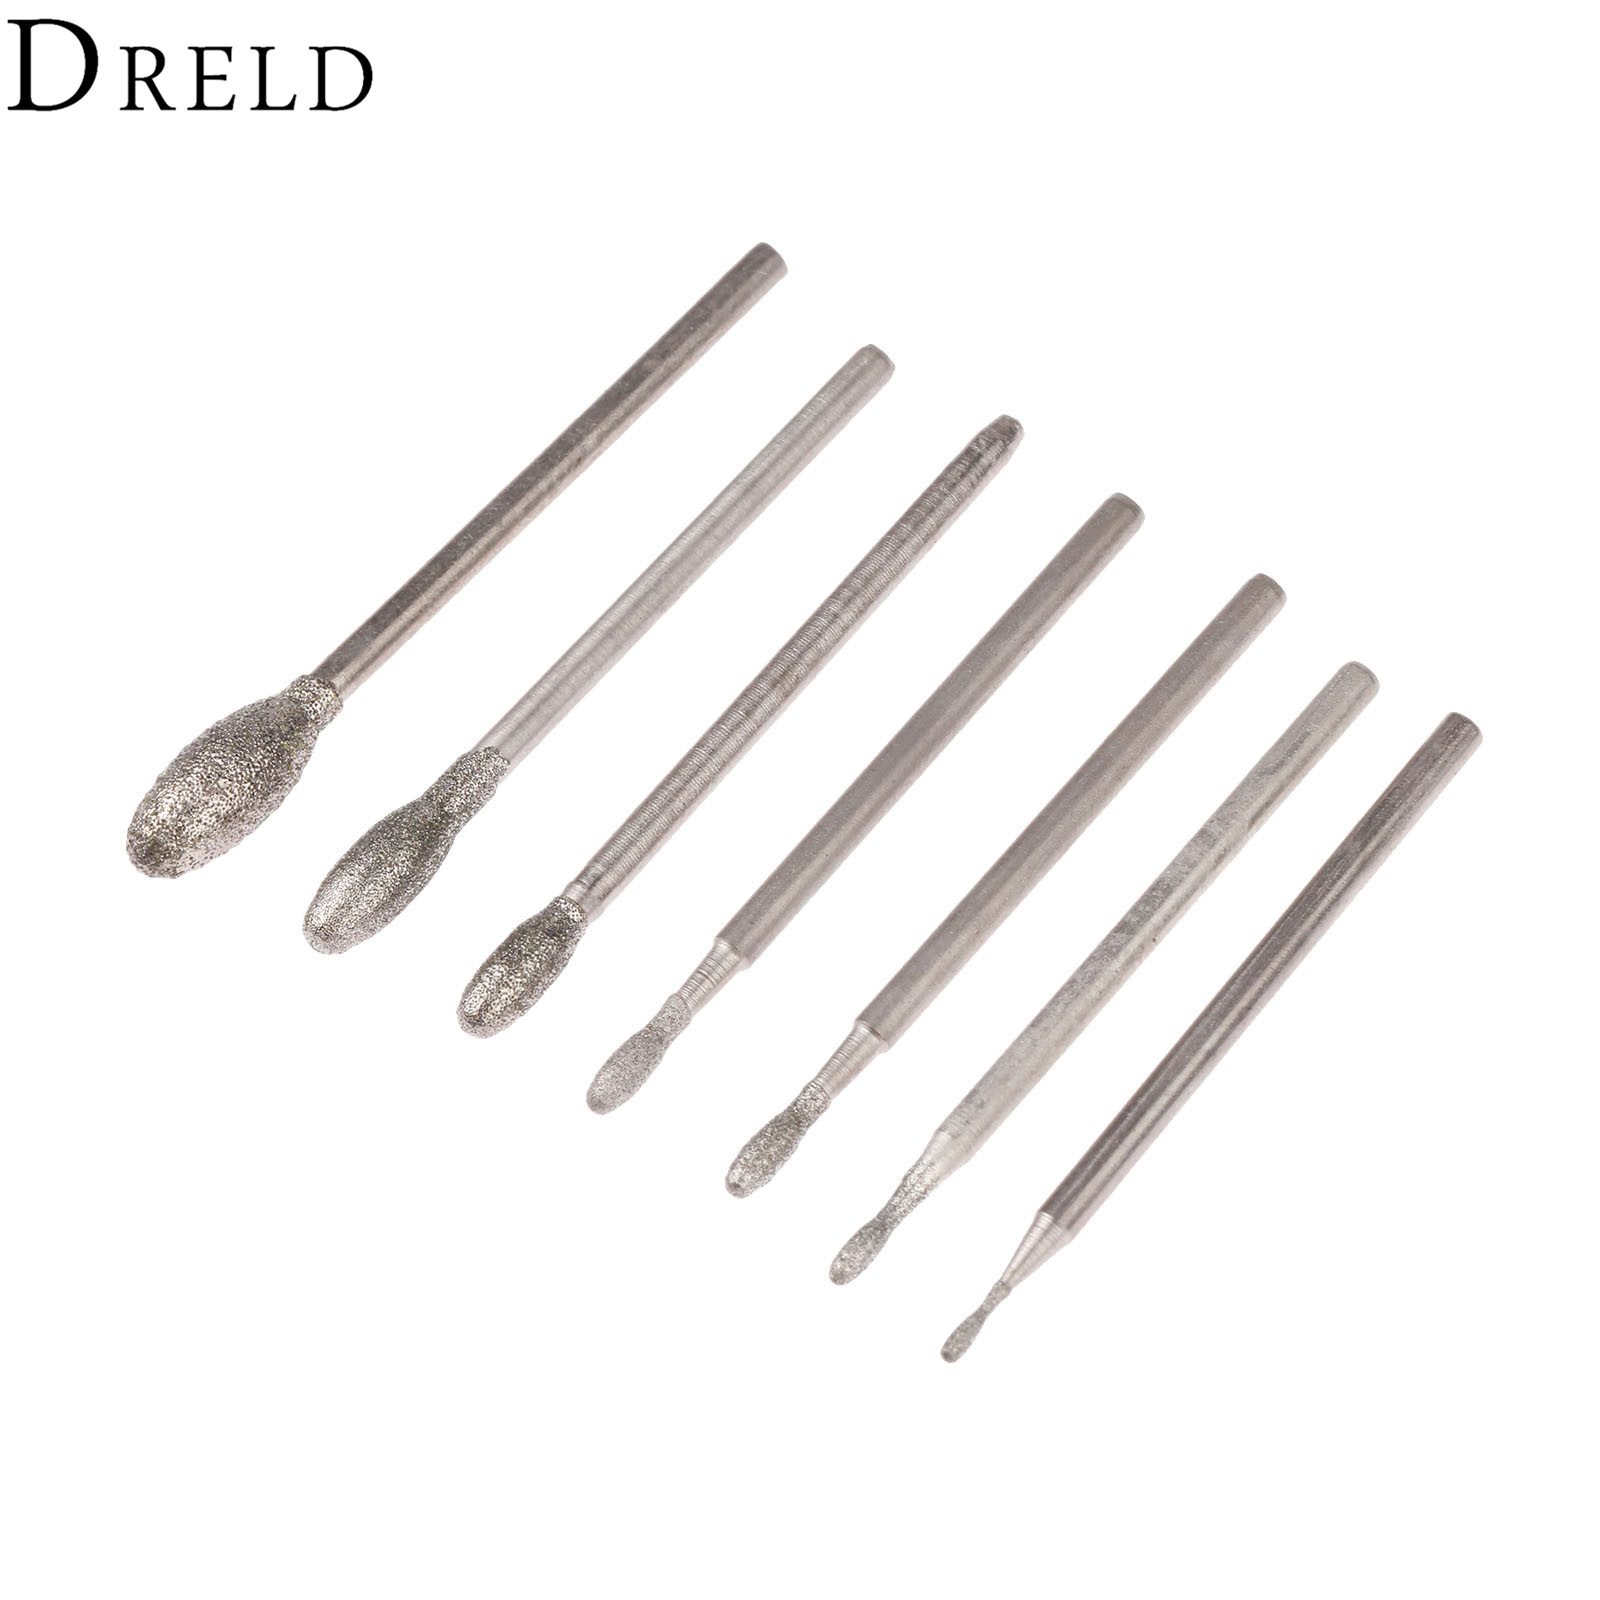 2.35mm Shank Bur Diamond Grinding Head Spherical Concave Head 7pcs//set Useful